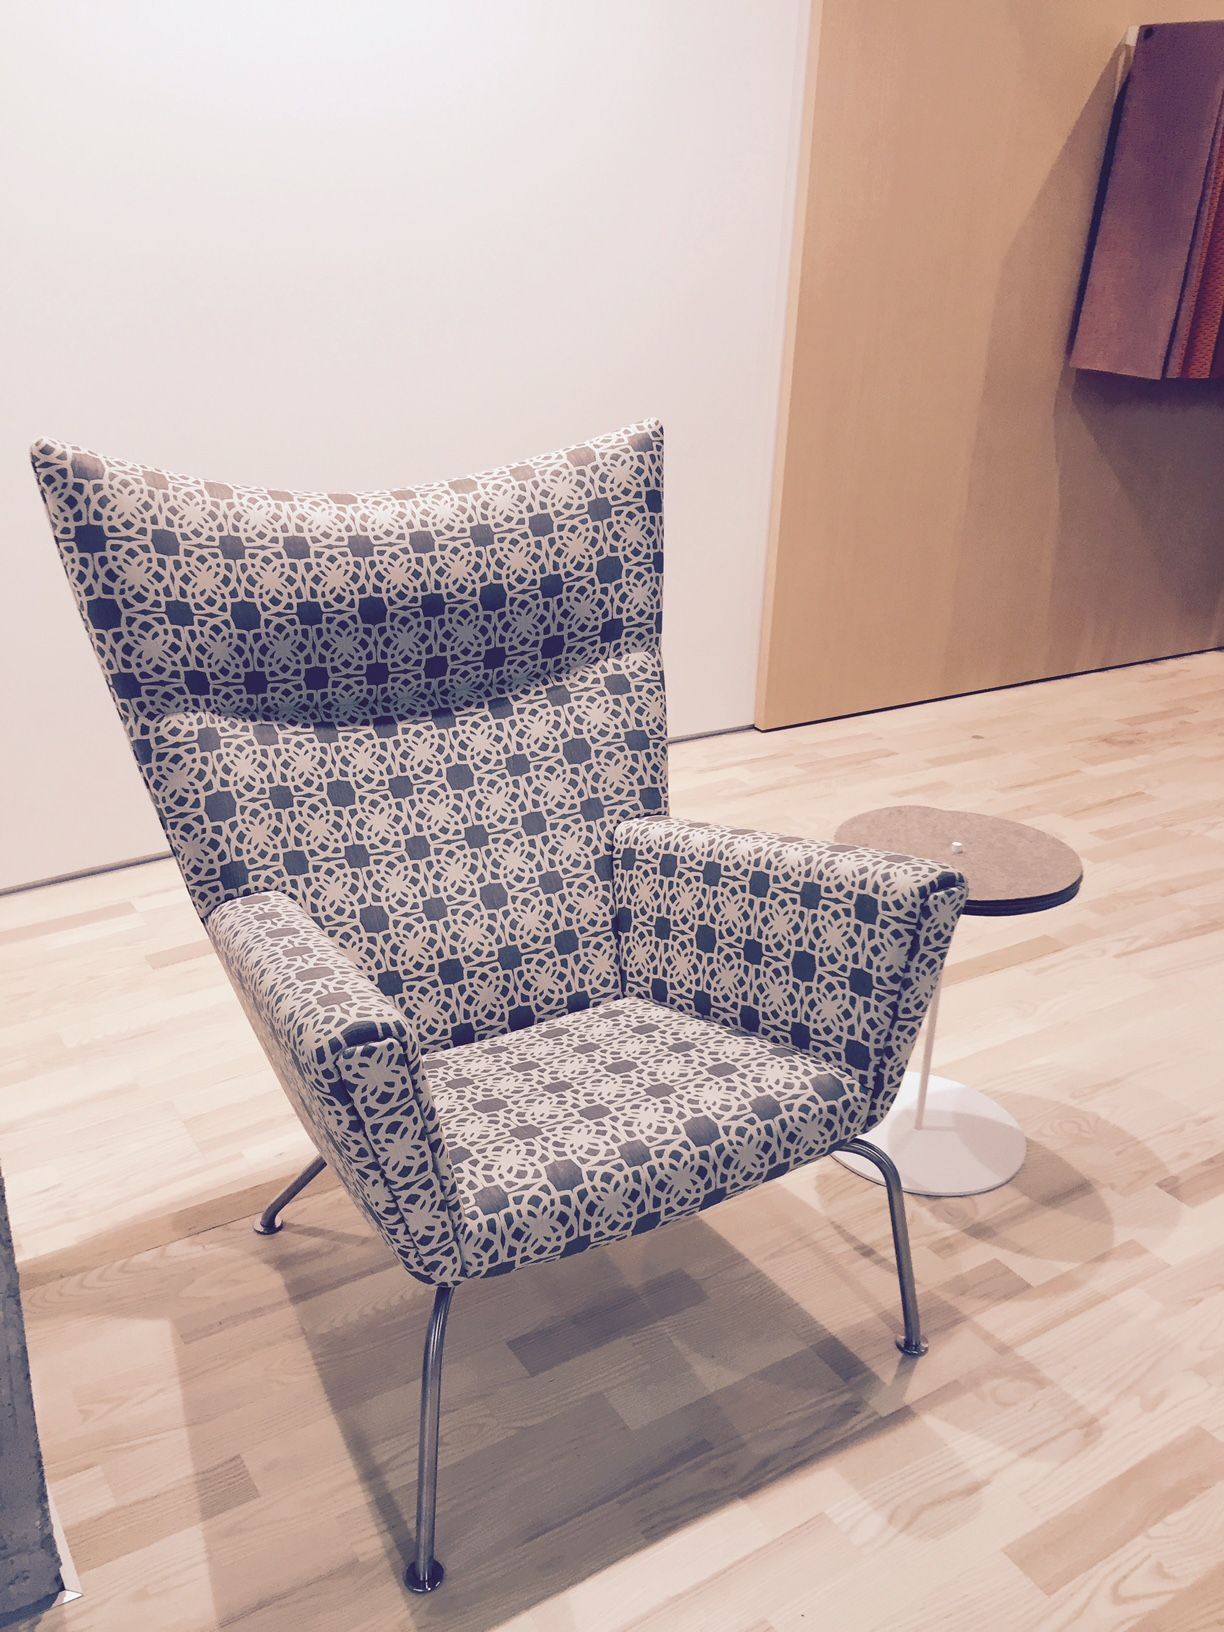 Coalesse Wing Chair in Designtex Lattice Upholstery